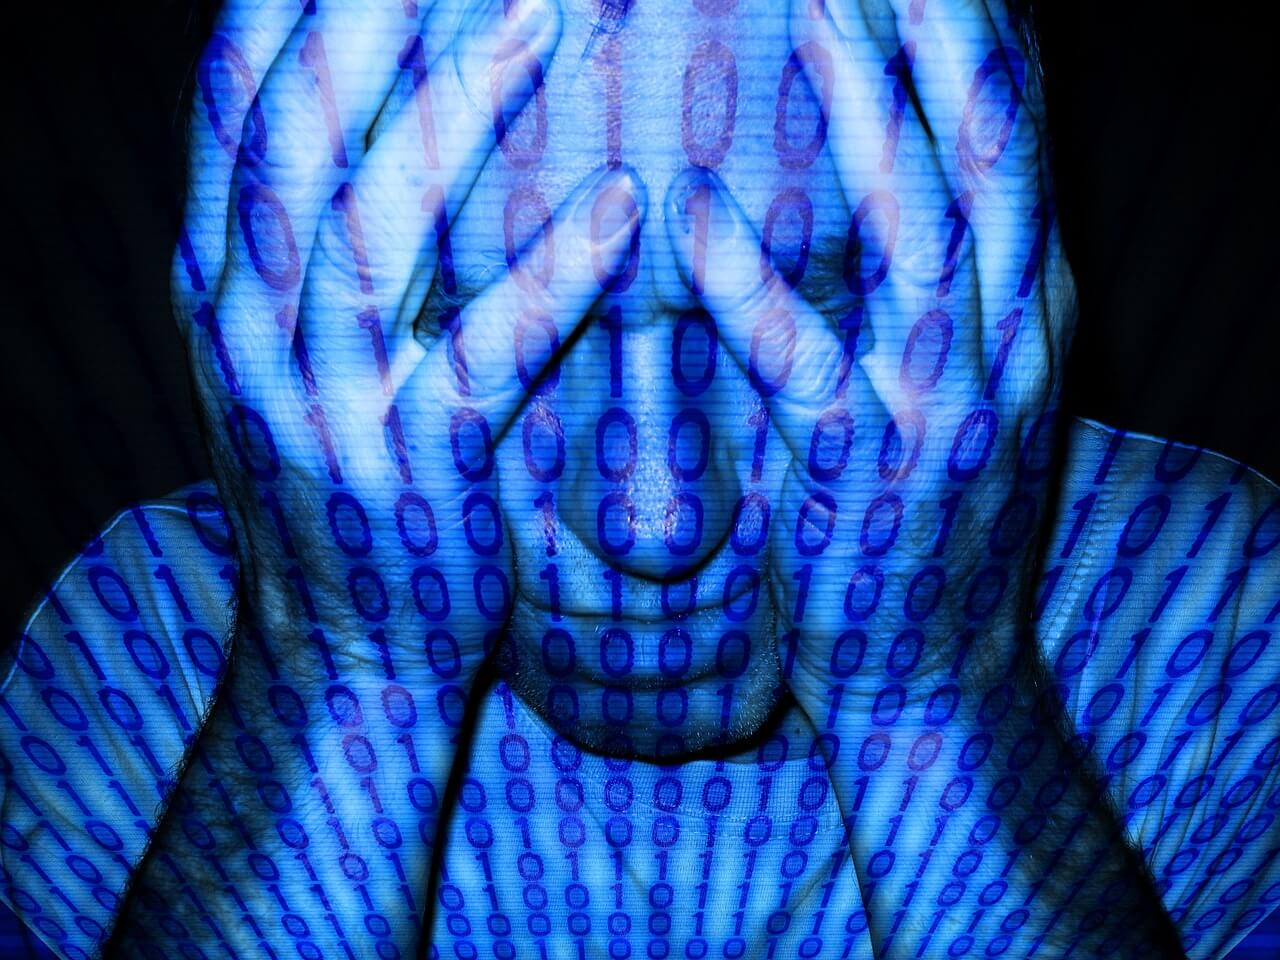 https://www.comparethecloud.net/articles/big-data-articles/i-am-a-human-not-an-algorithm/